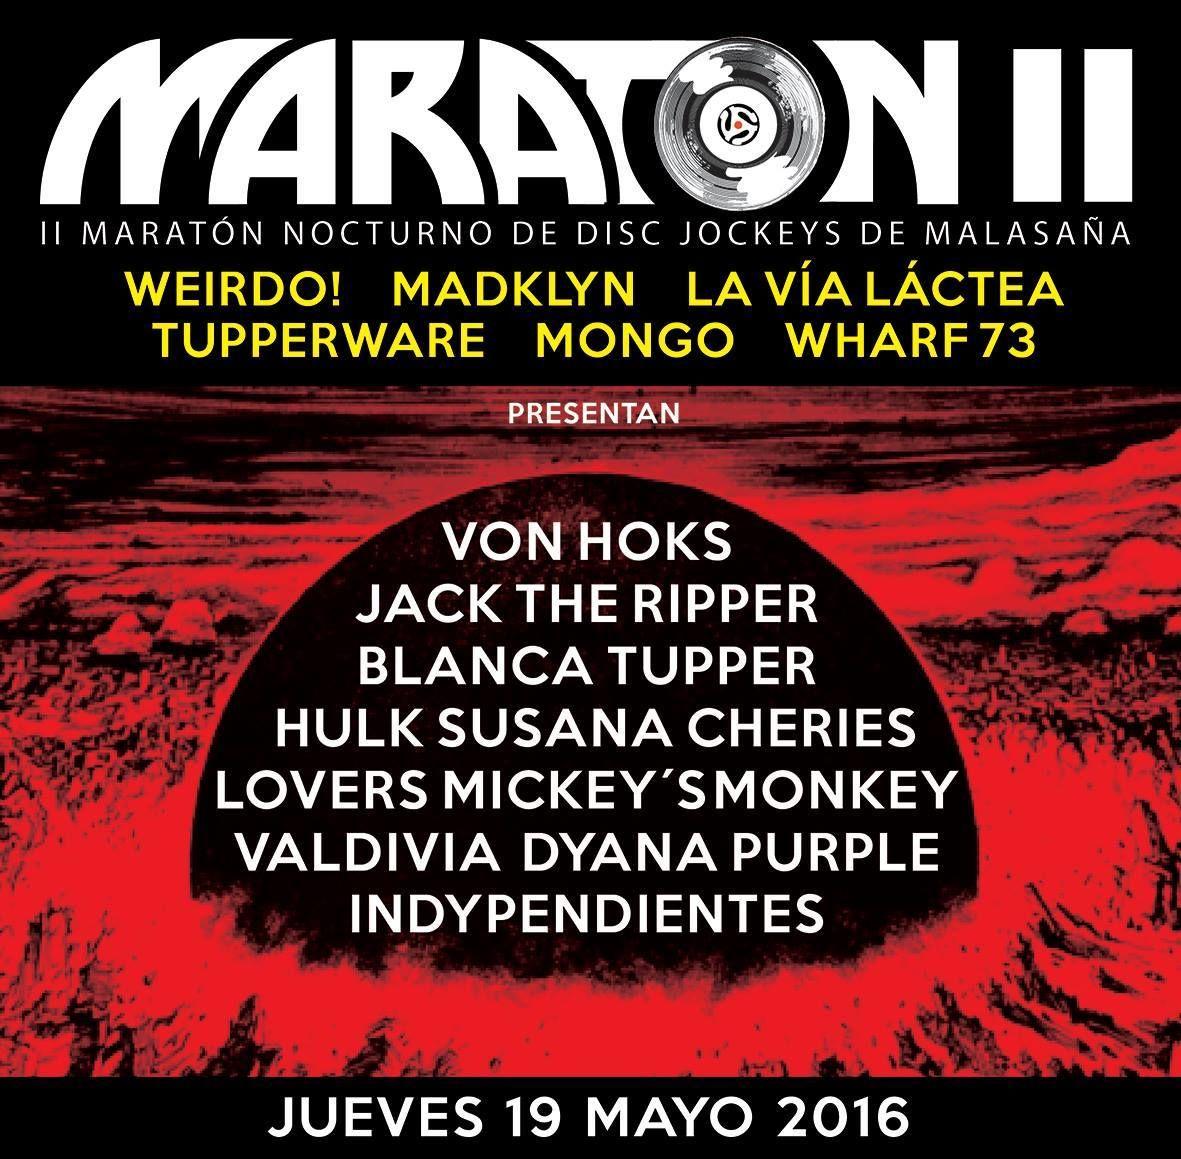 Cartel anunciador del II maratón de DJs